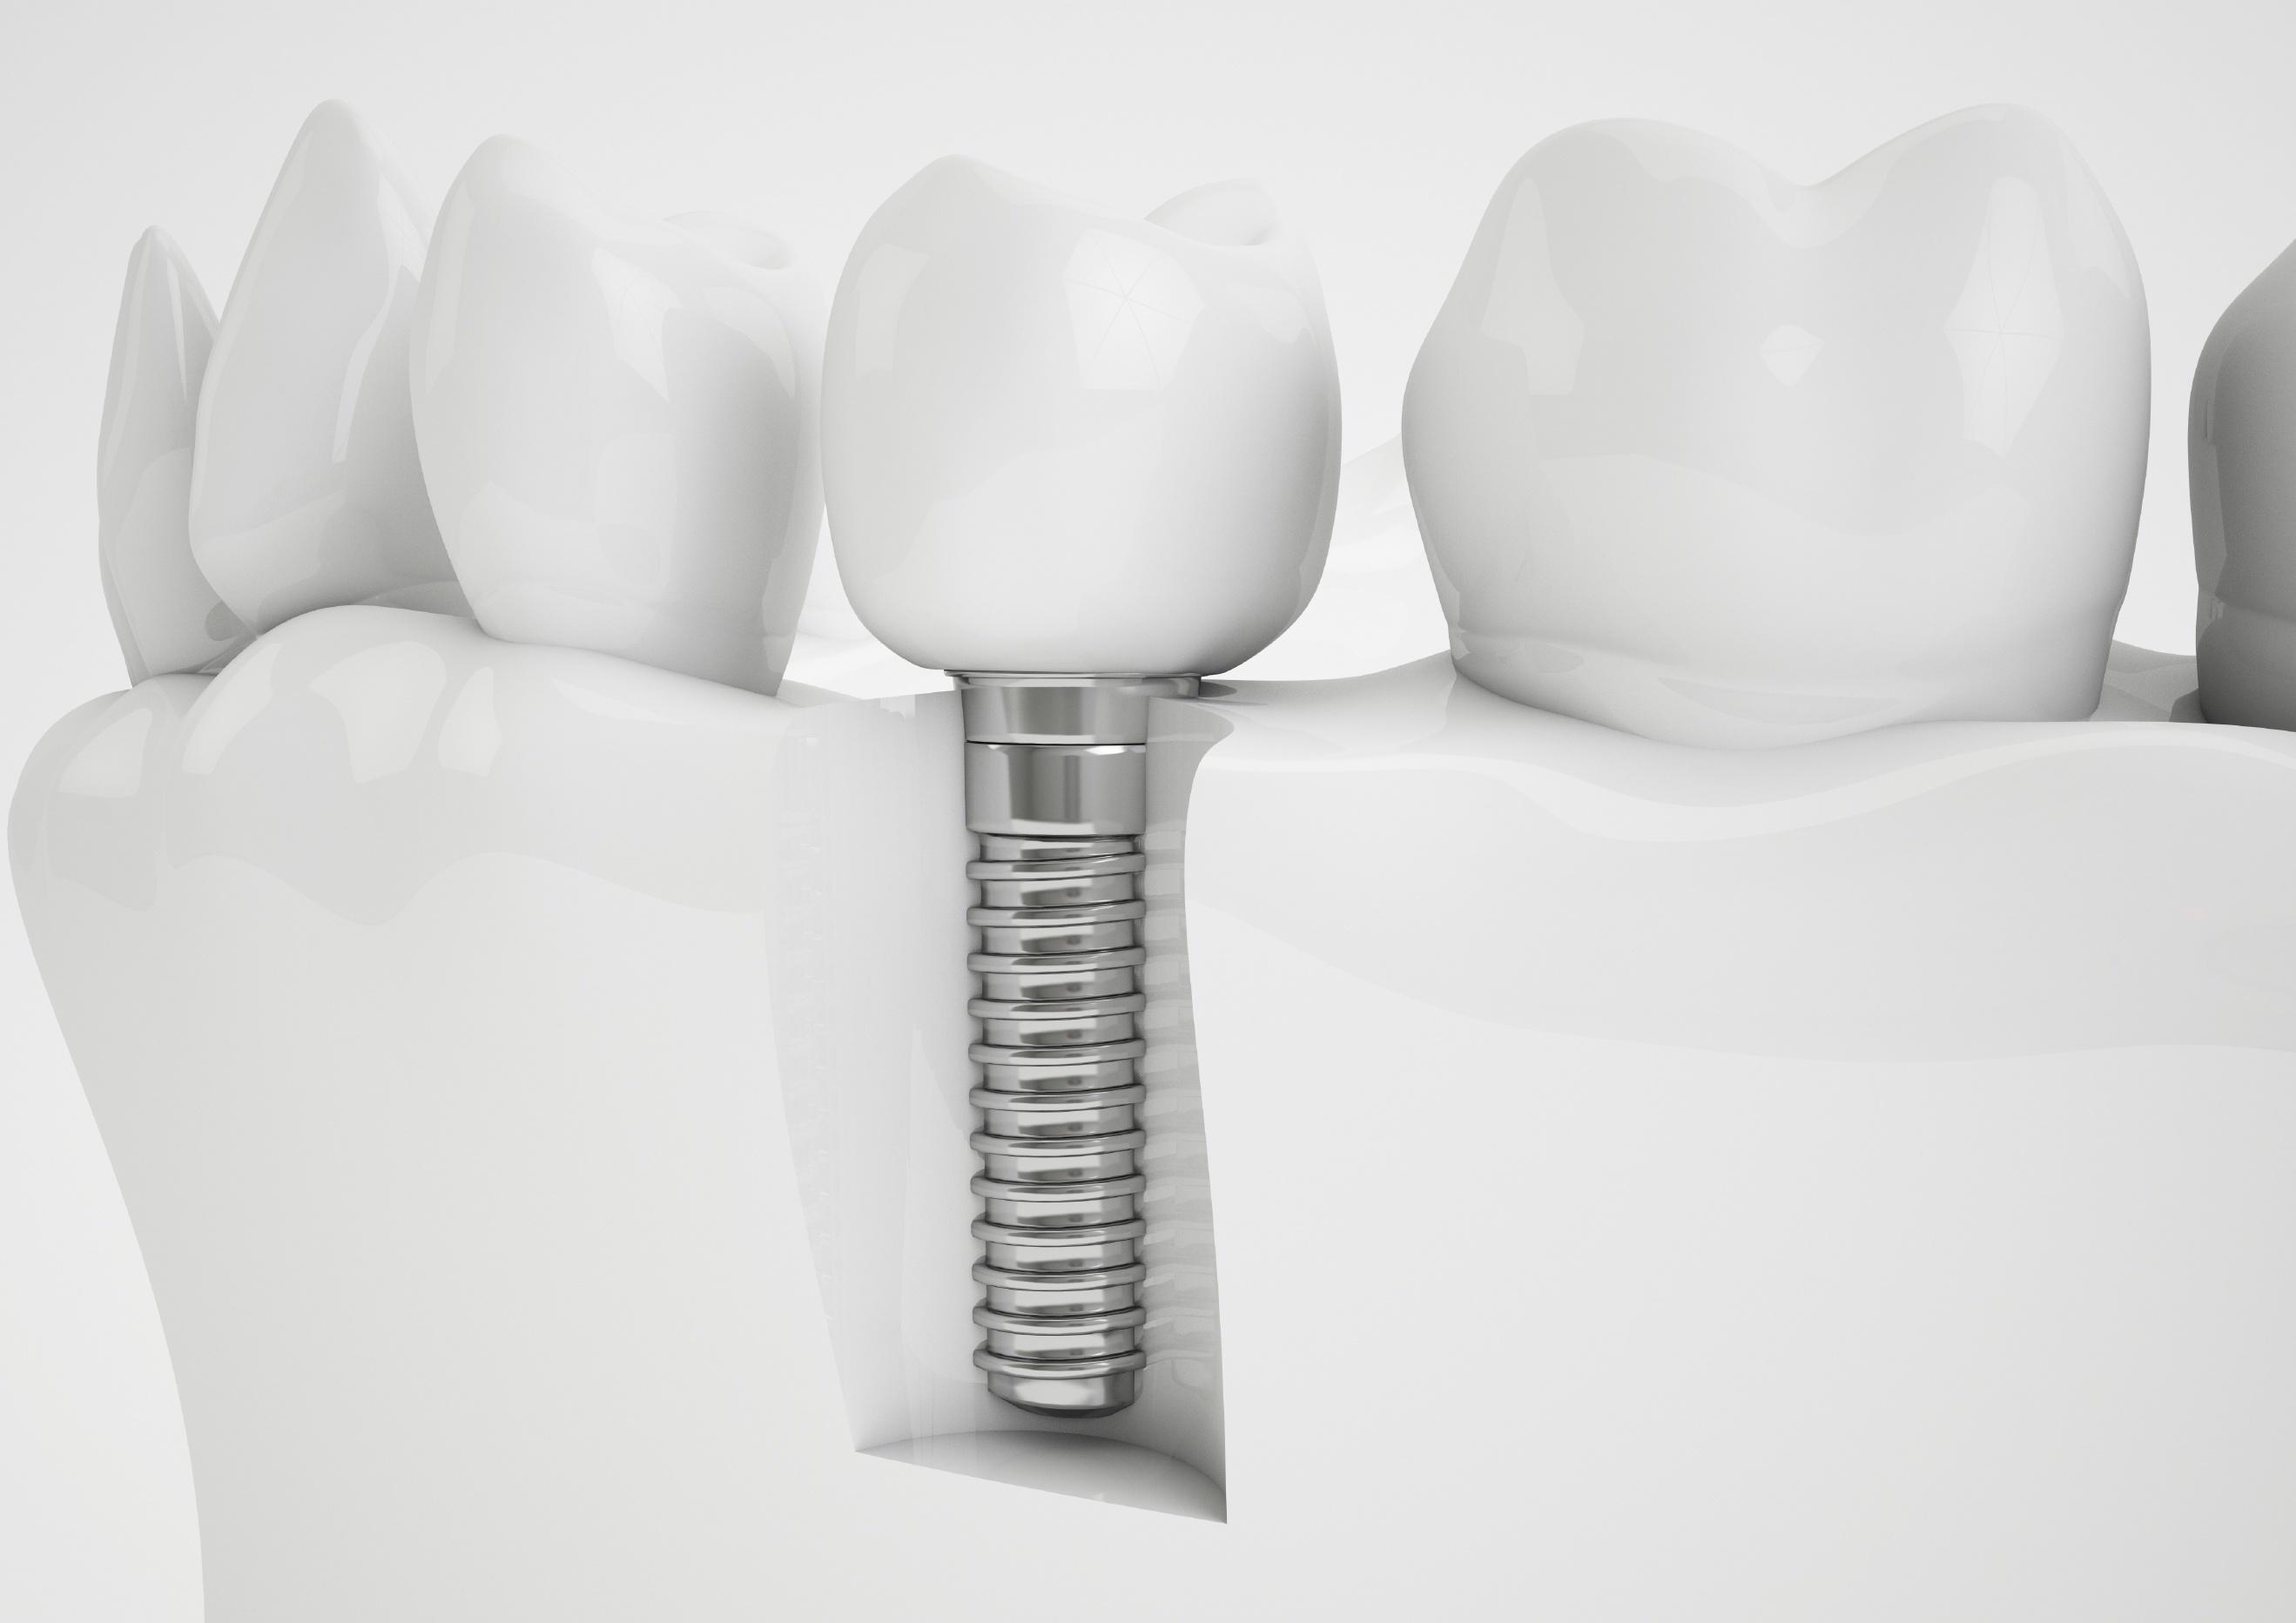 ascent-family-dental-implants